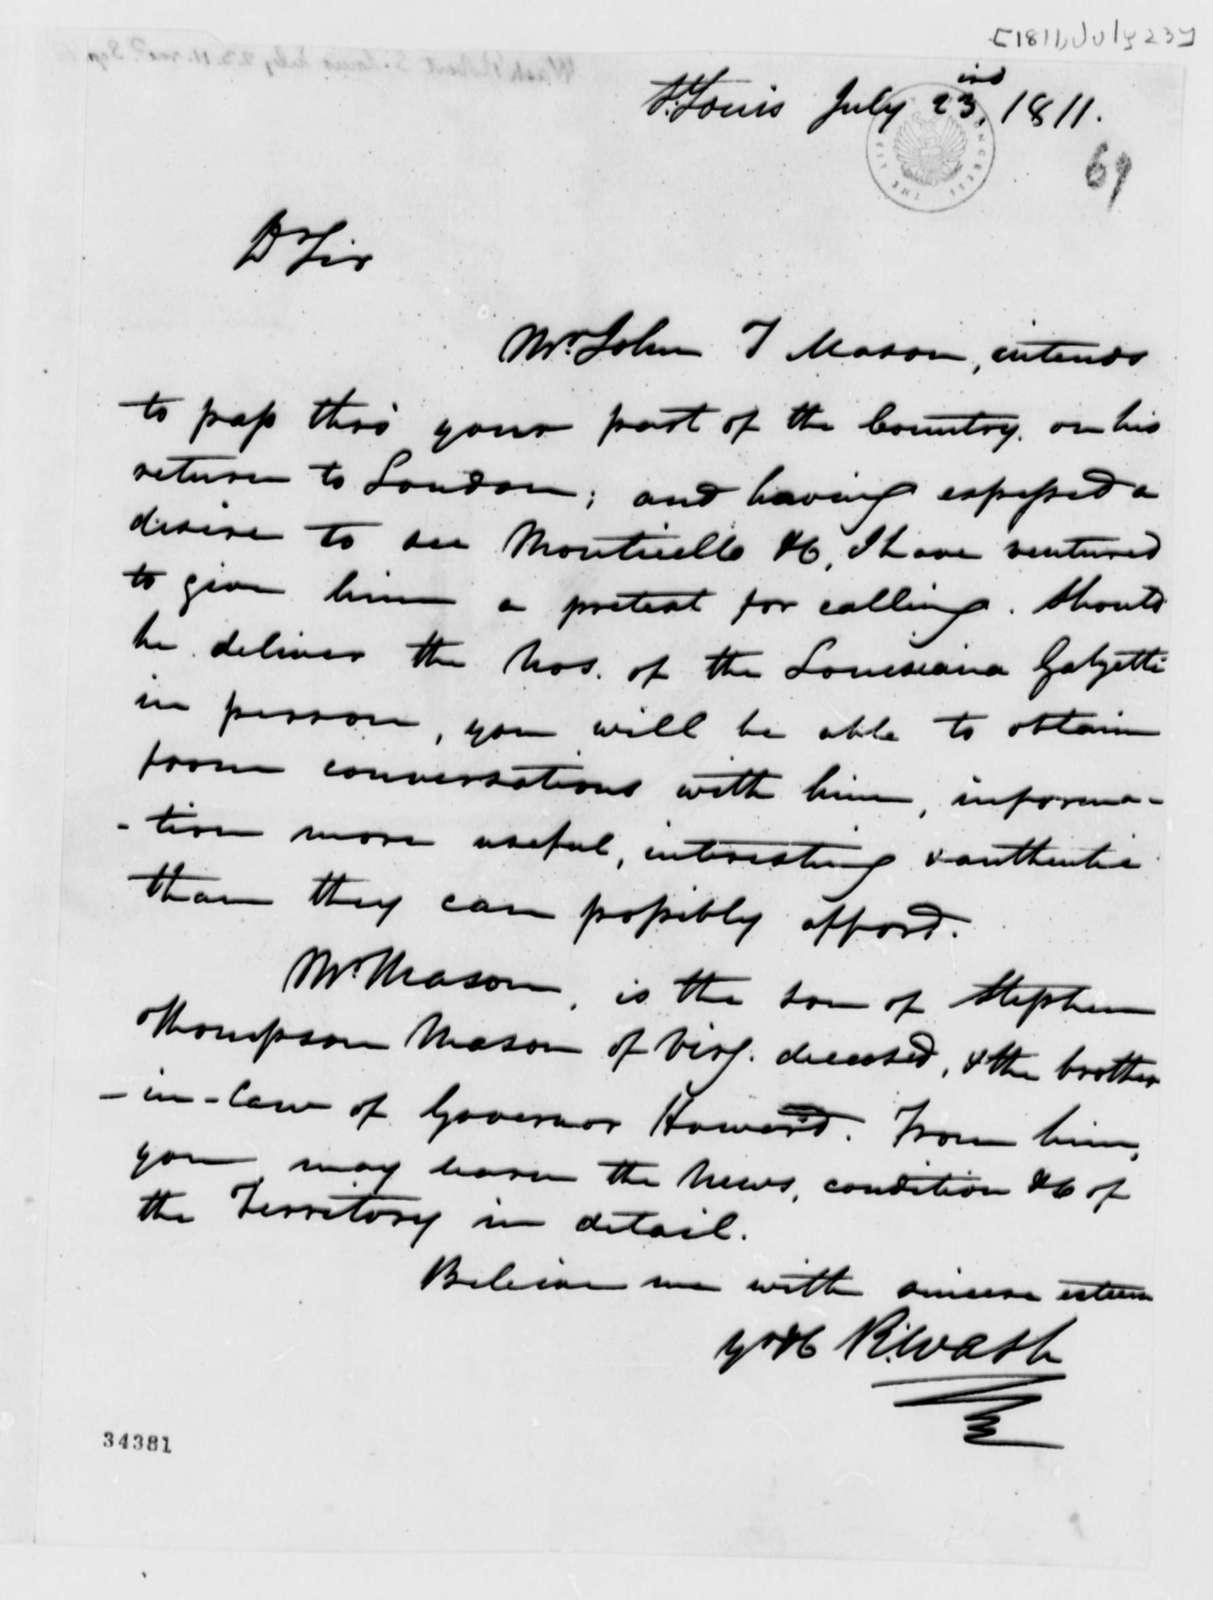 Robart Wash to Thomas Jefferson, July 23, 1811